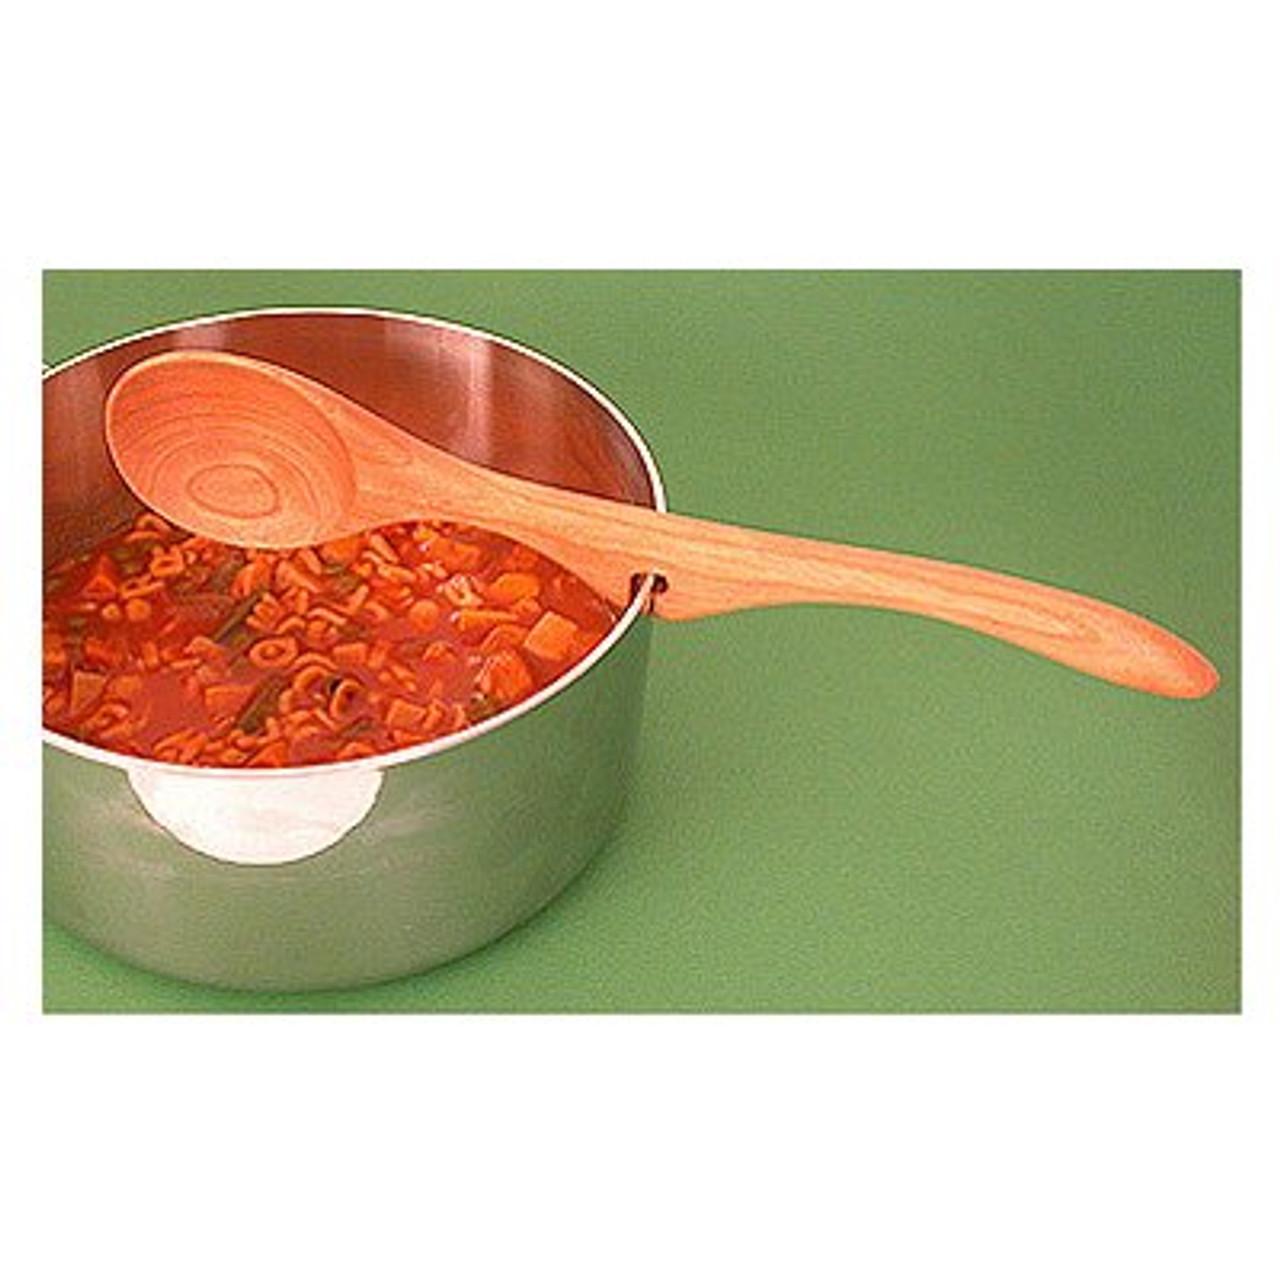 Jonathan's Wild Cherry Spoons Stirring Lazy Spoon